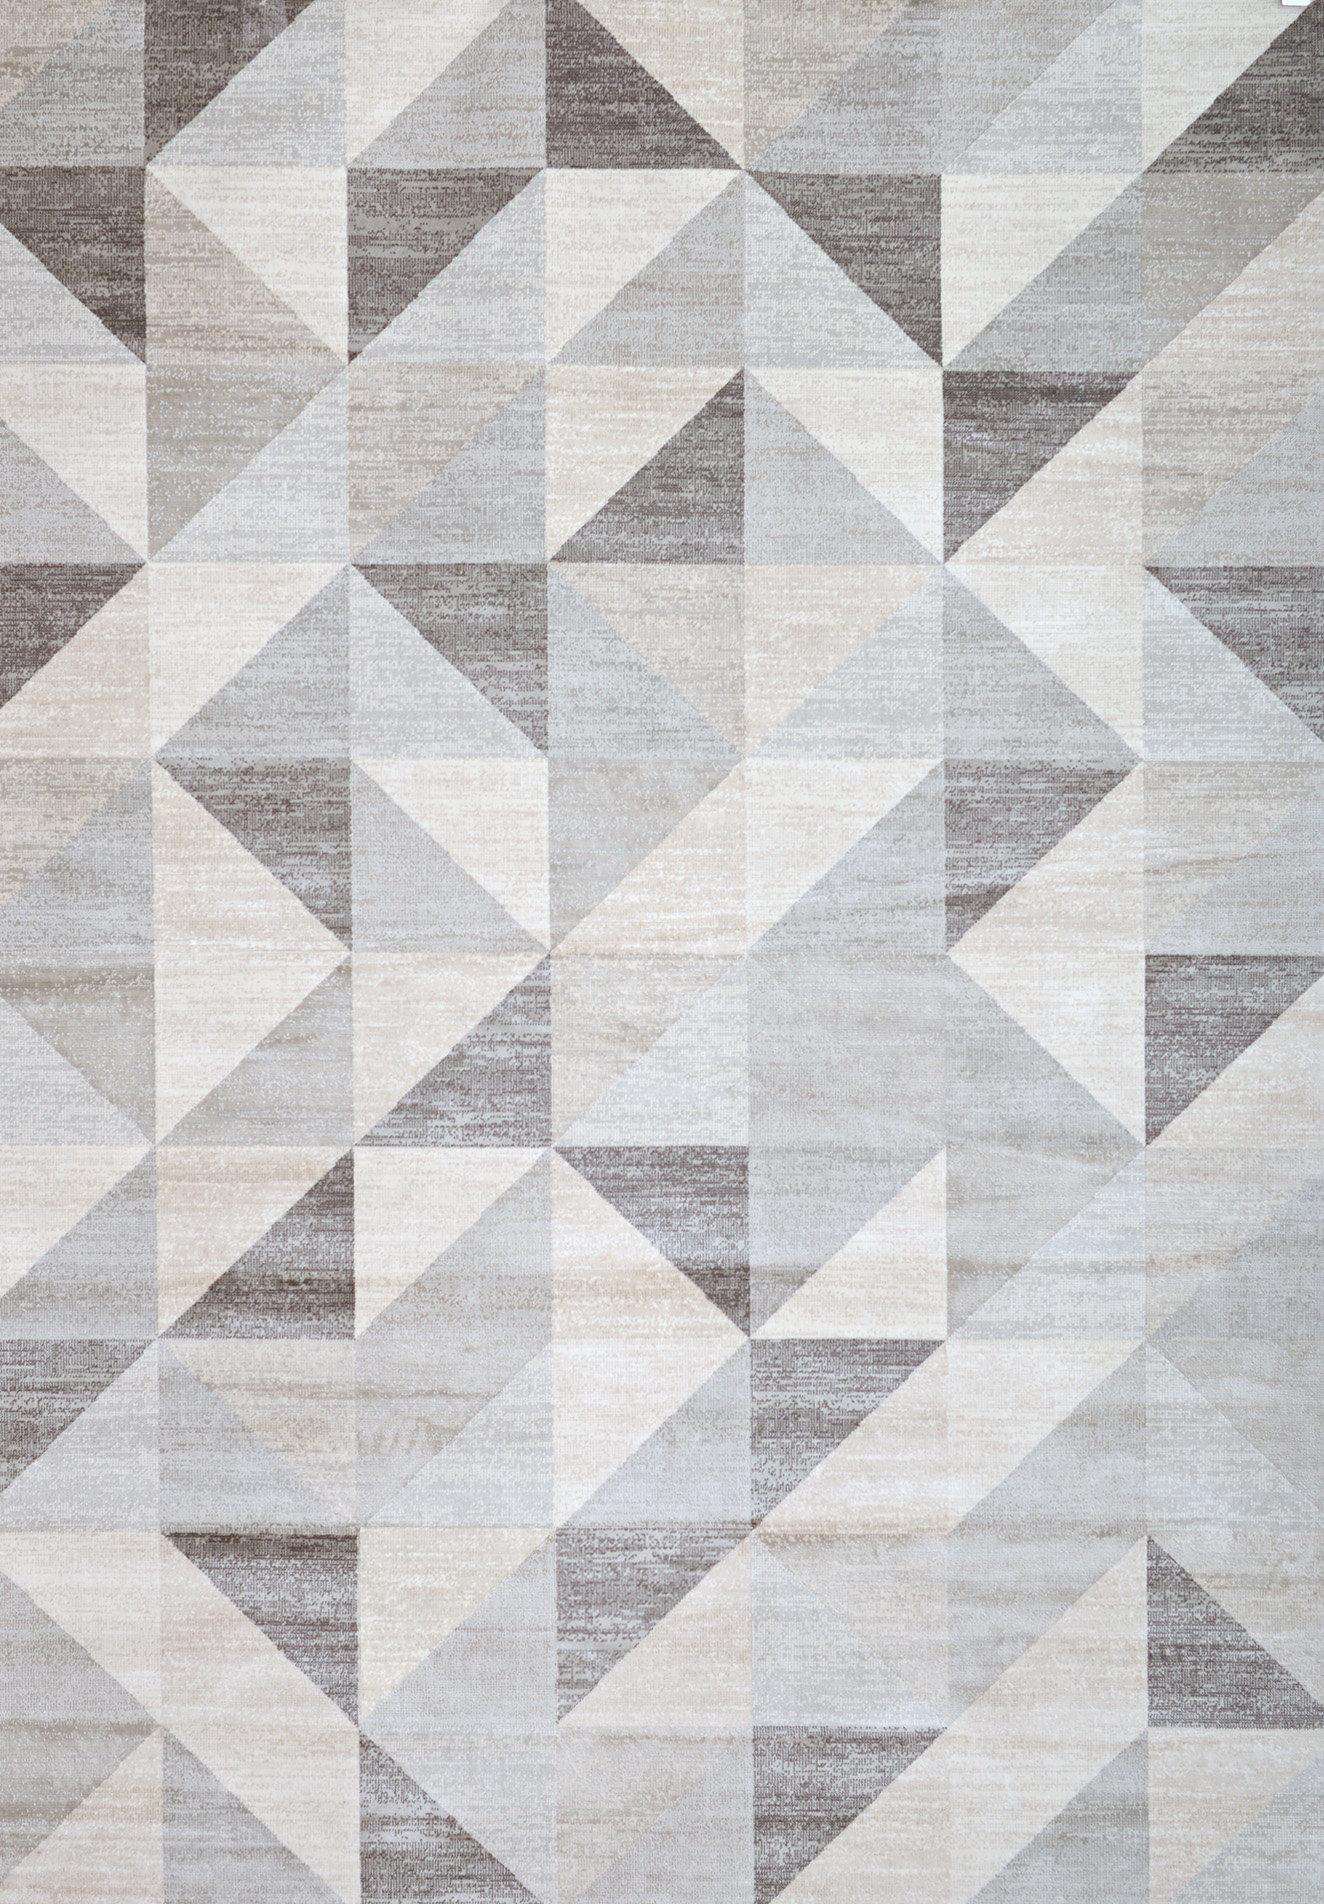 Abacasa Sonoma GreyWhite Area Rug Reviews Wayfair